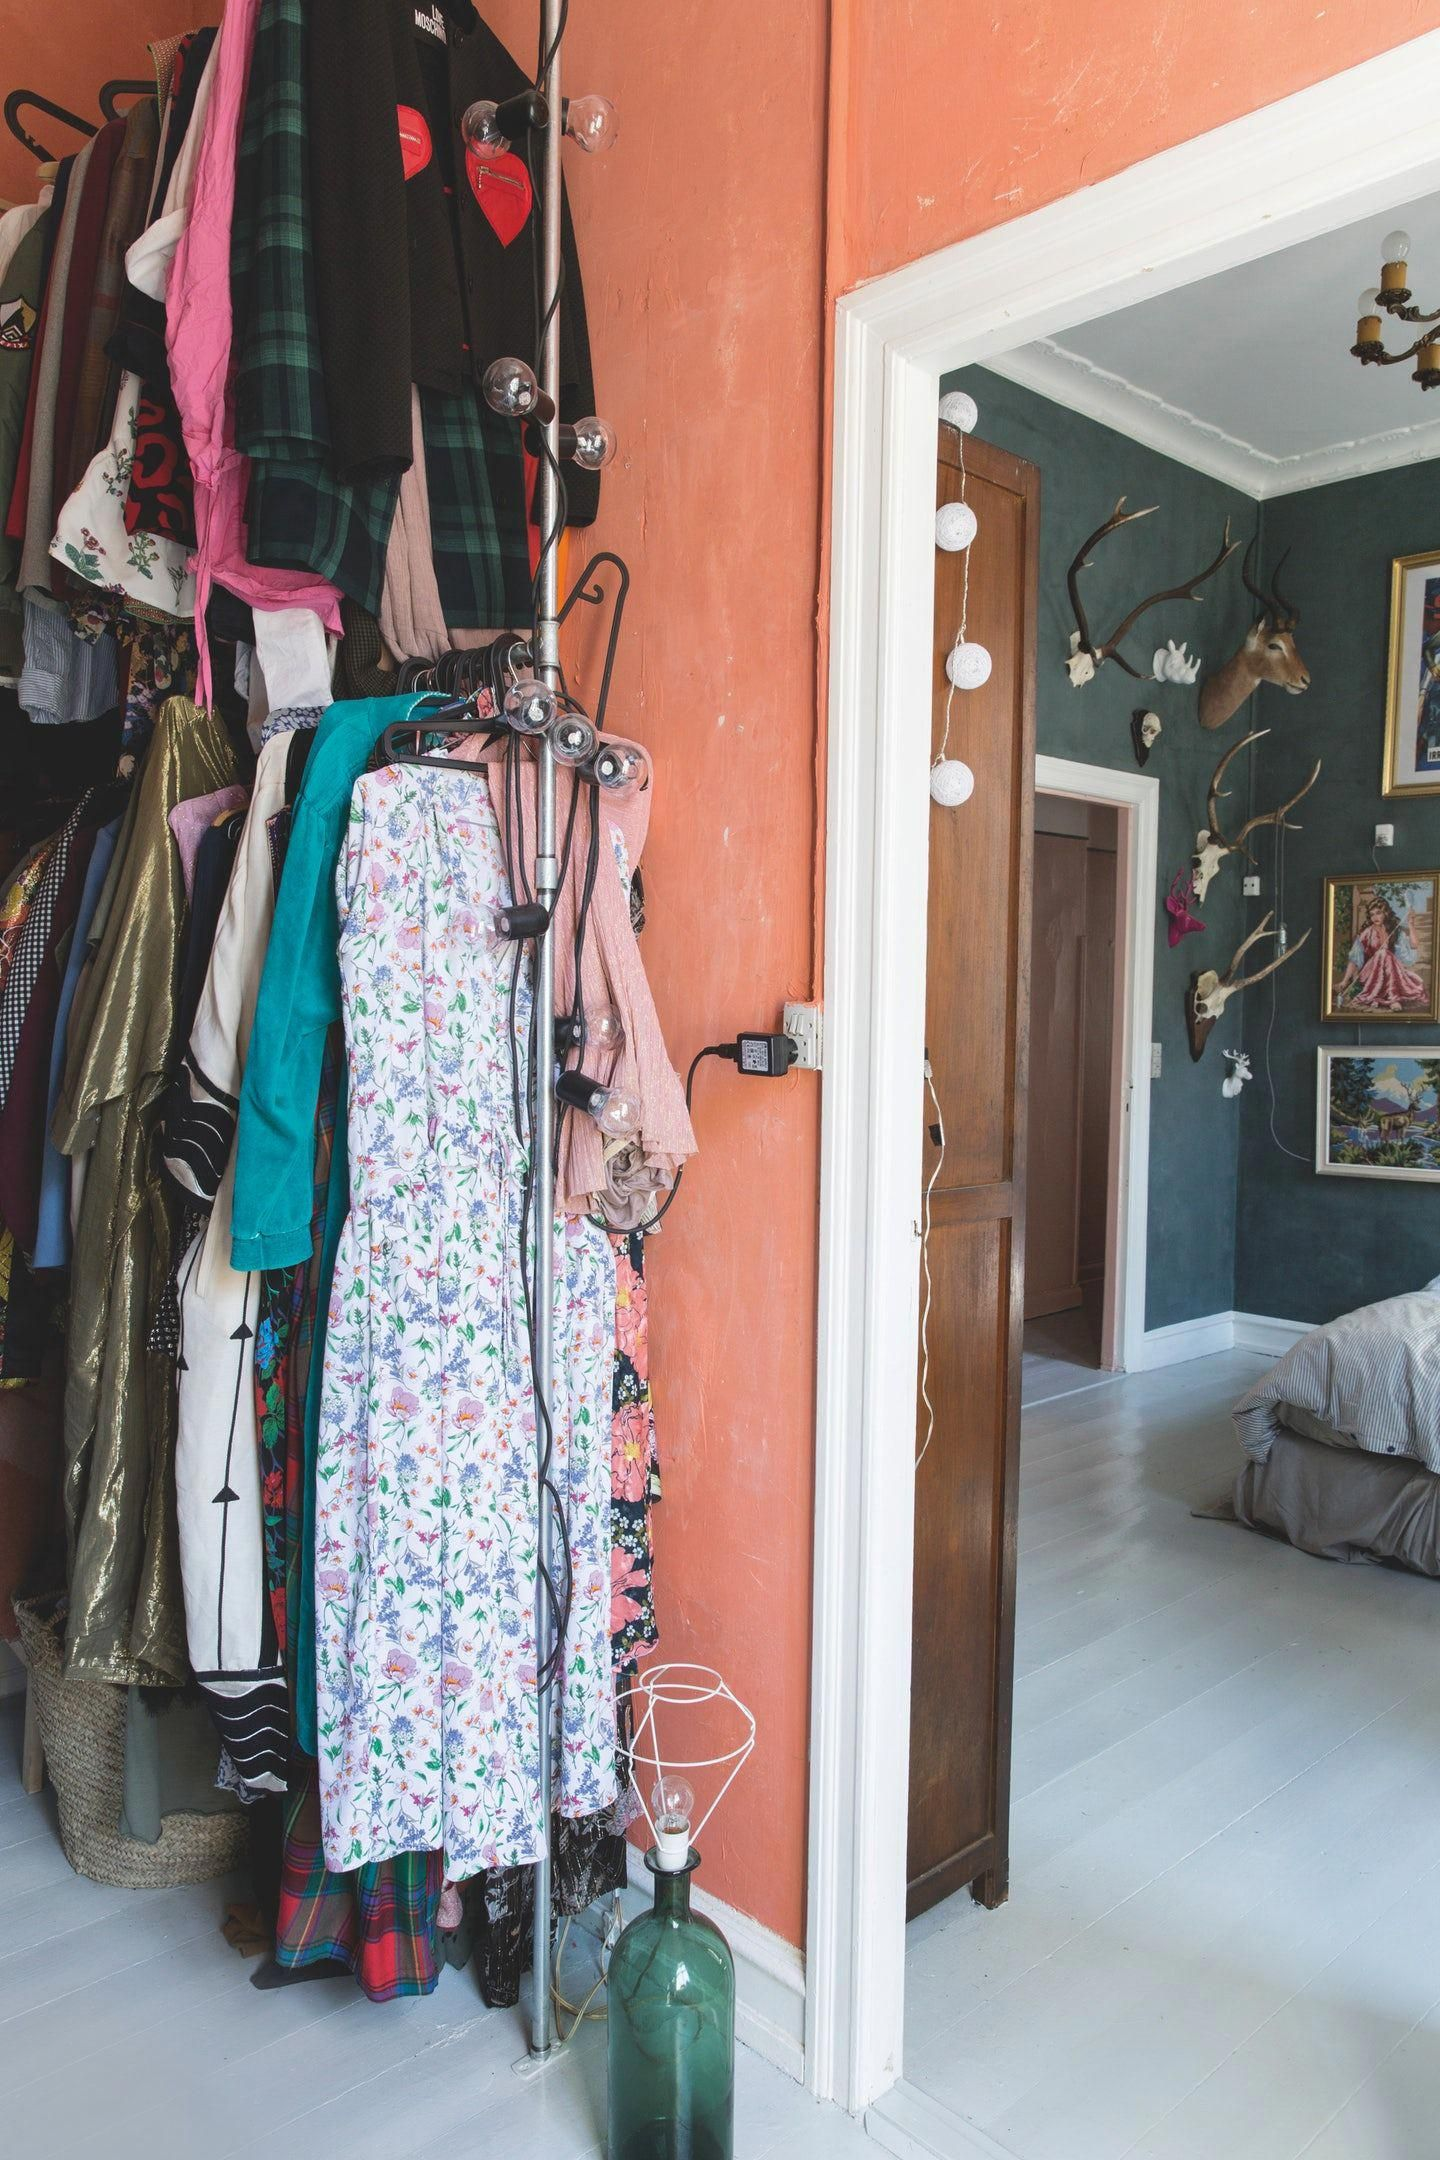 Sofie og Joakim Linde Ingversens hjem #livingroommodern